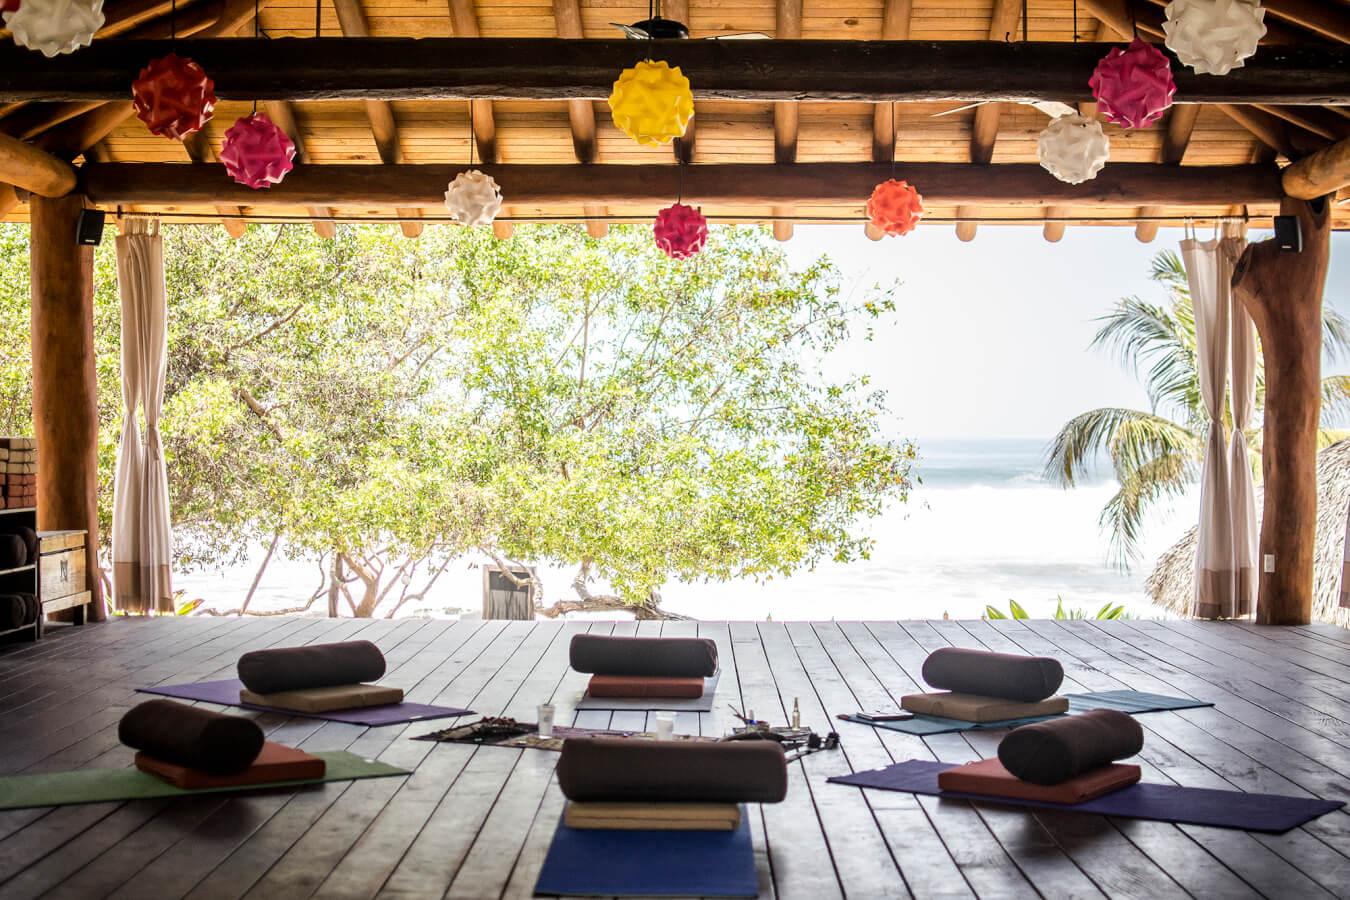 Sacred-AUM-Cacao-Ceremony-w-Emily-Ray-Henderson-Yoga-Platform-Present-Moment-Retreat-Troncones-Mexico-Yoga-Retreat-Boutique-Hotel-Spa-Resort-LovaLinda-Photography.jpg